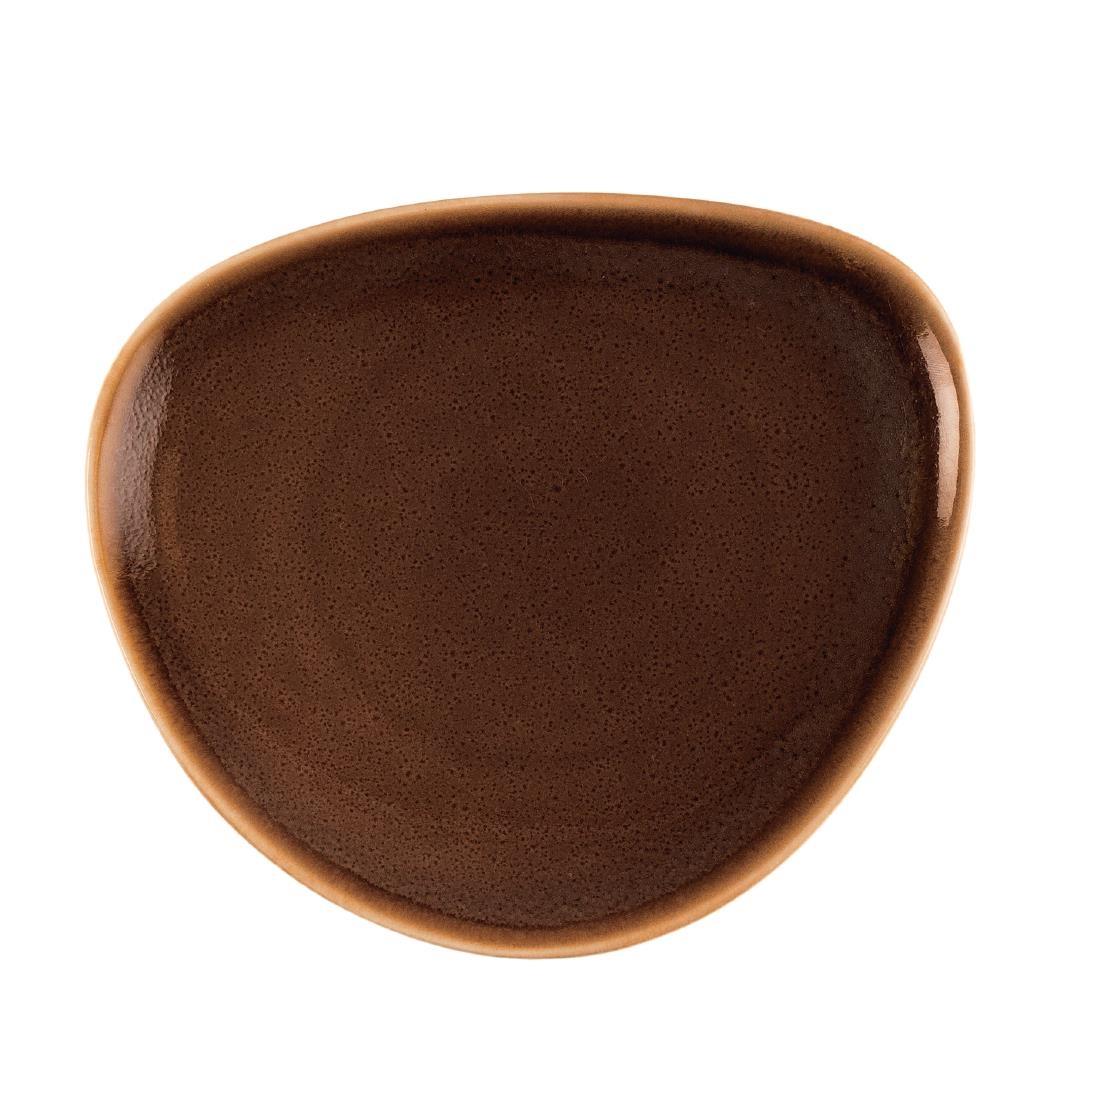 Triangular Plate - Bark